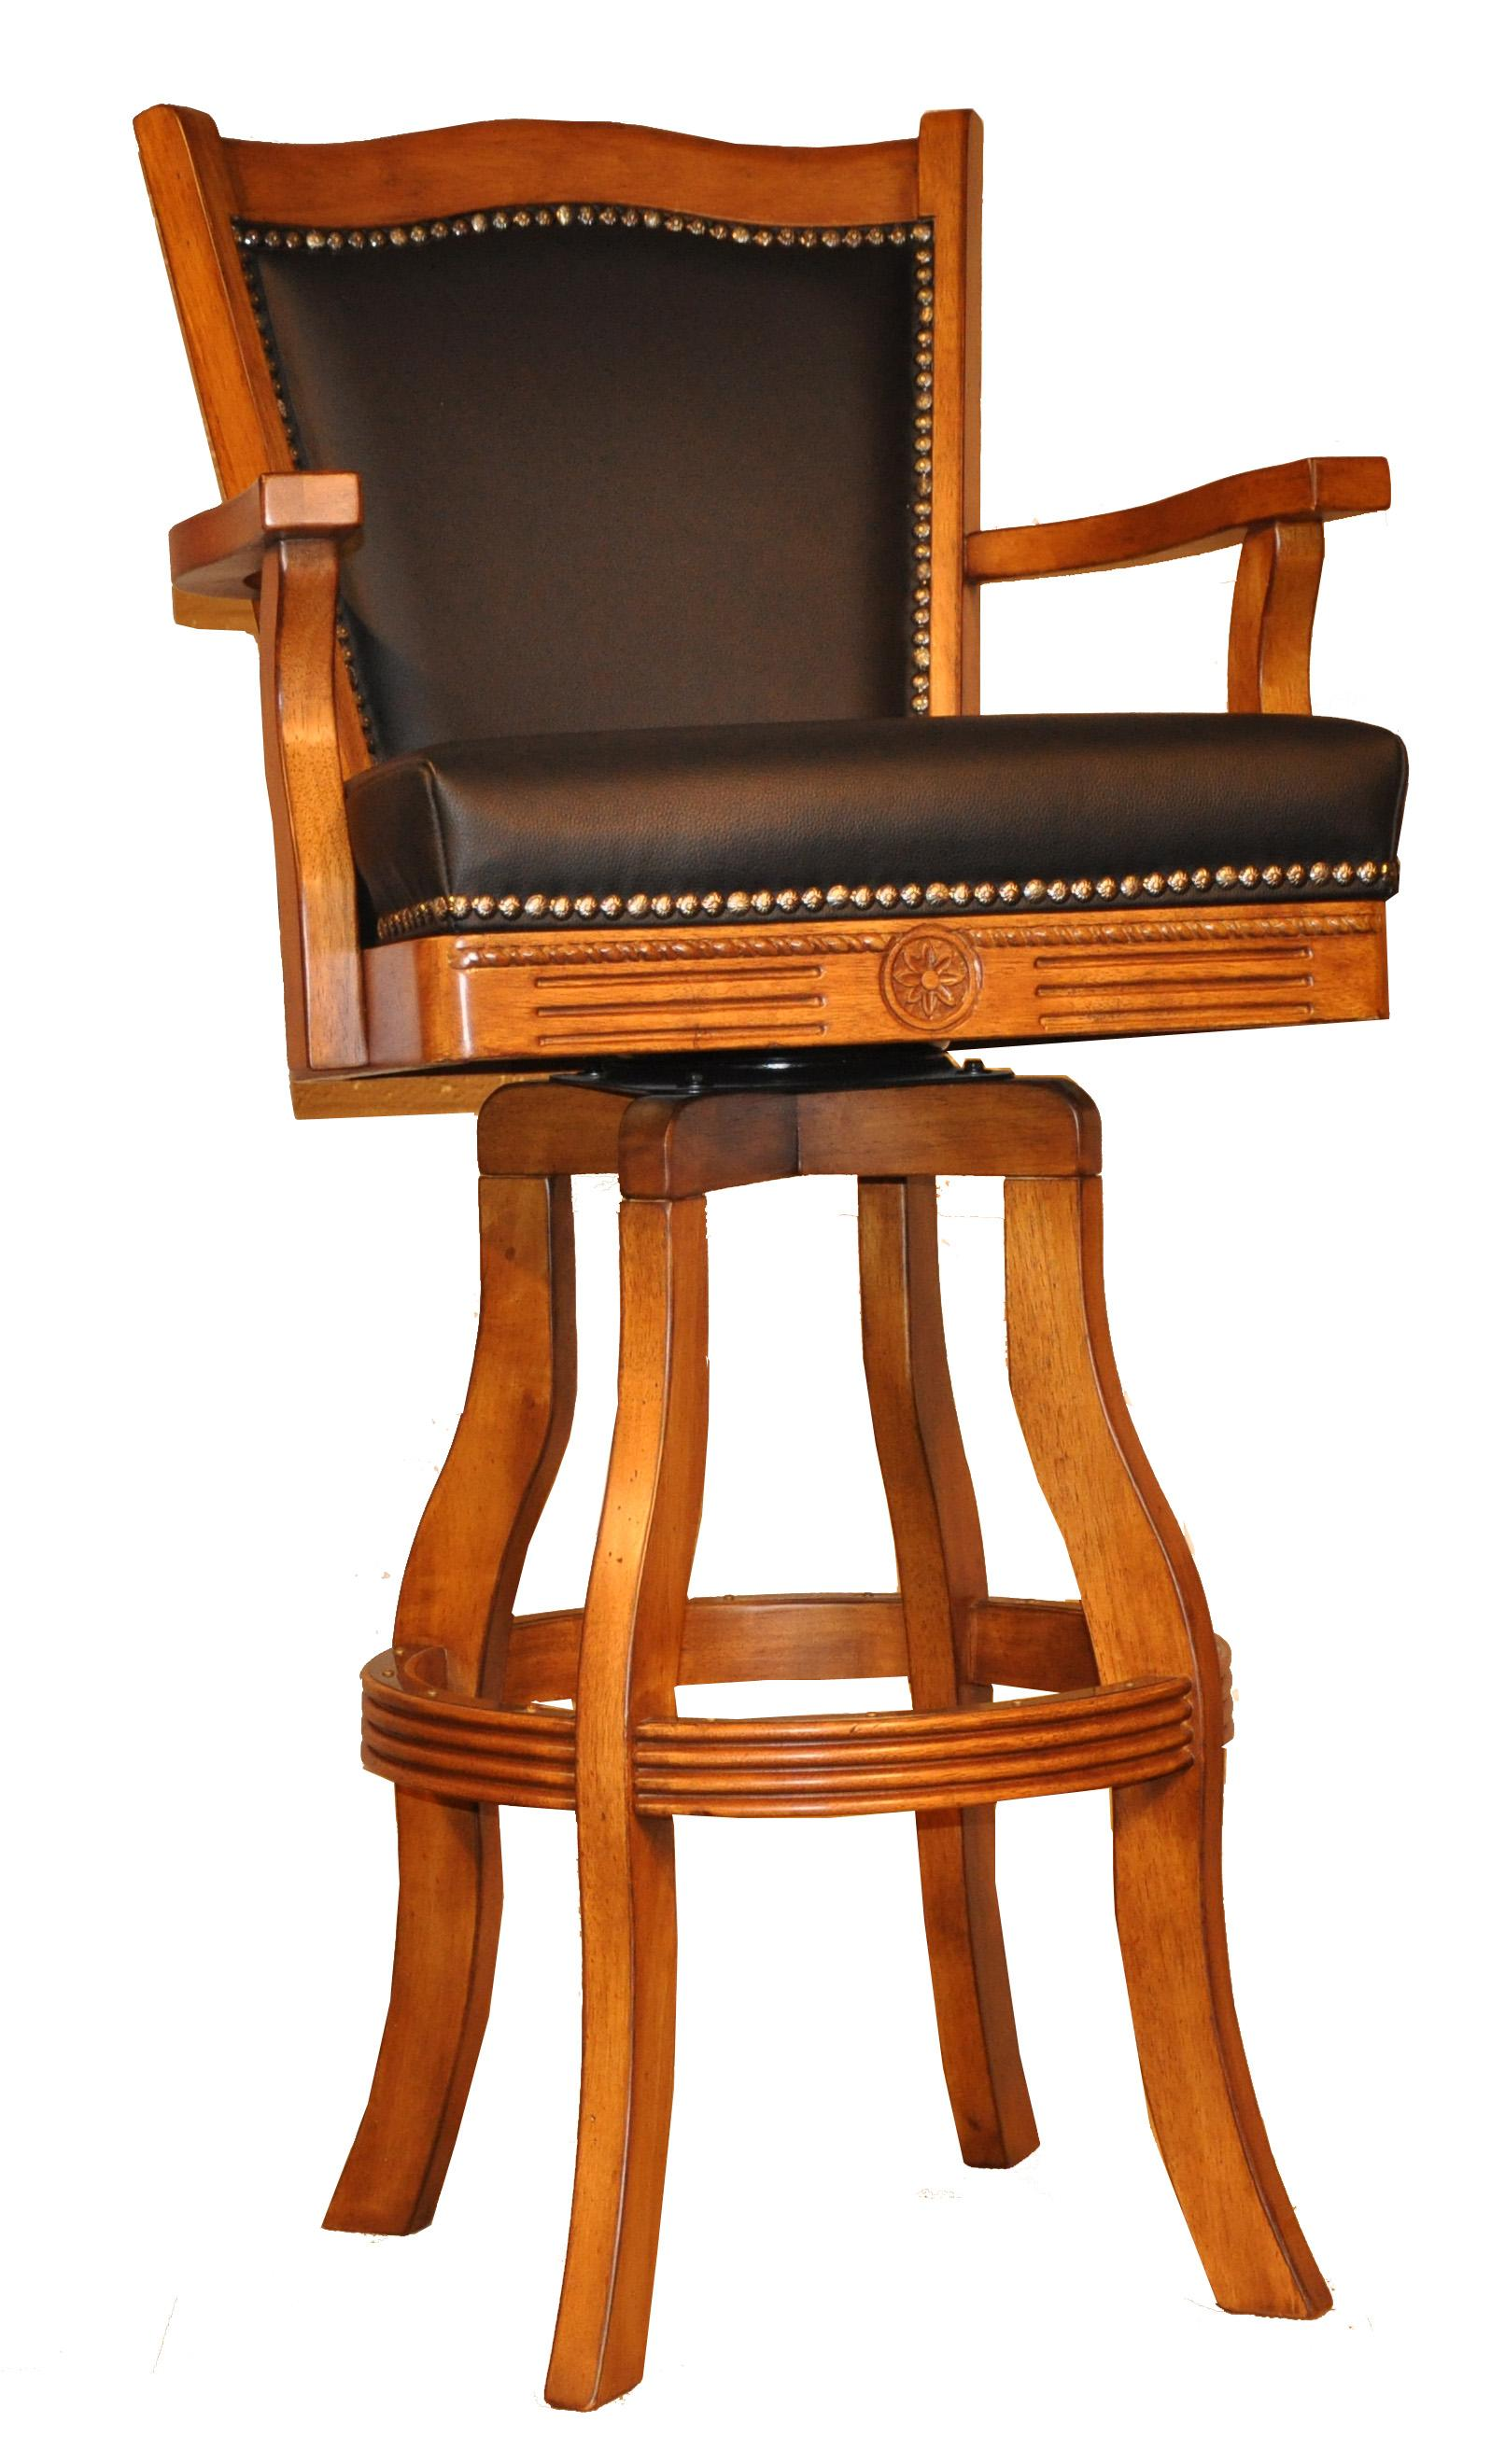 "E.C.I. Furniture Bar Stools 30"" Leather Nailhead Barstool - Item Number: 7040-03-BS-30"